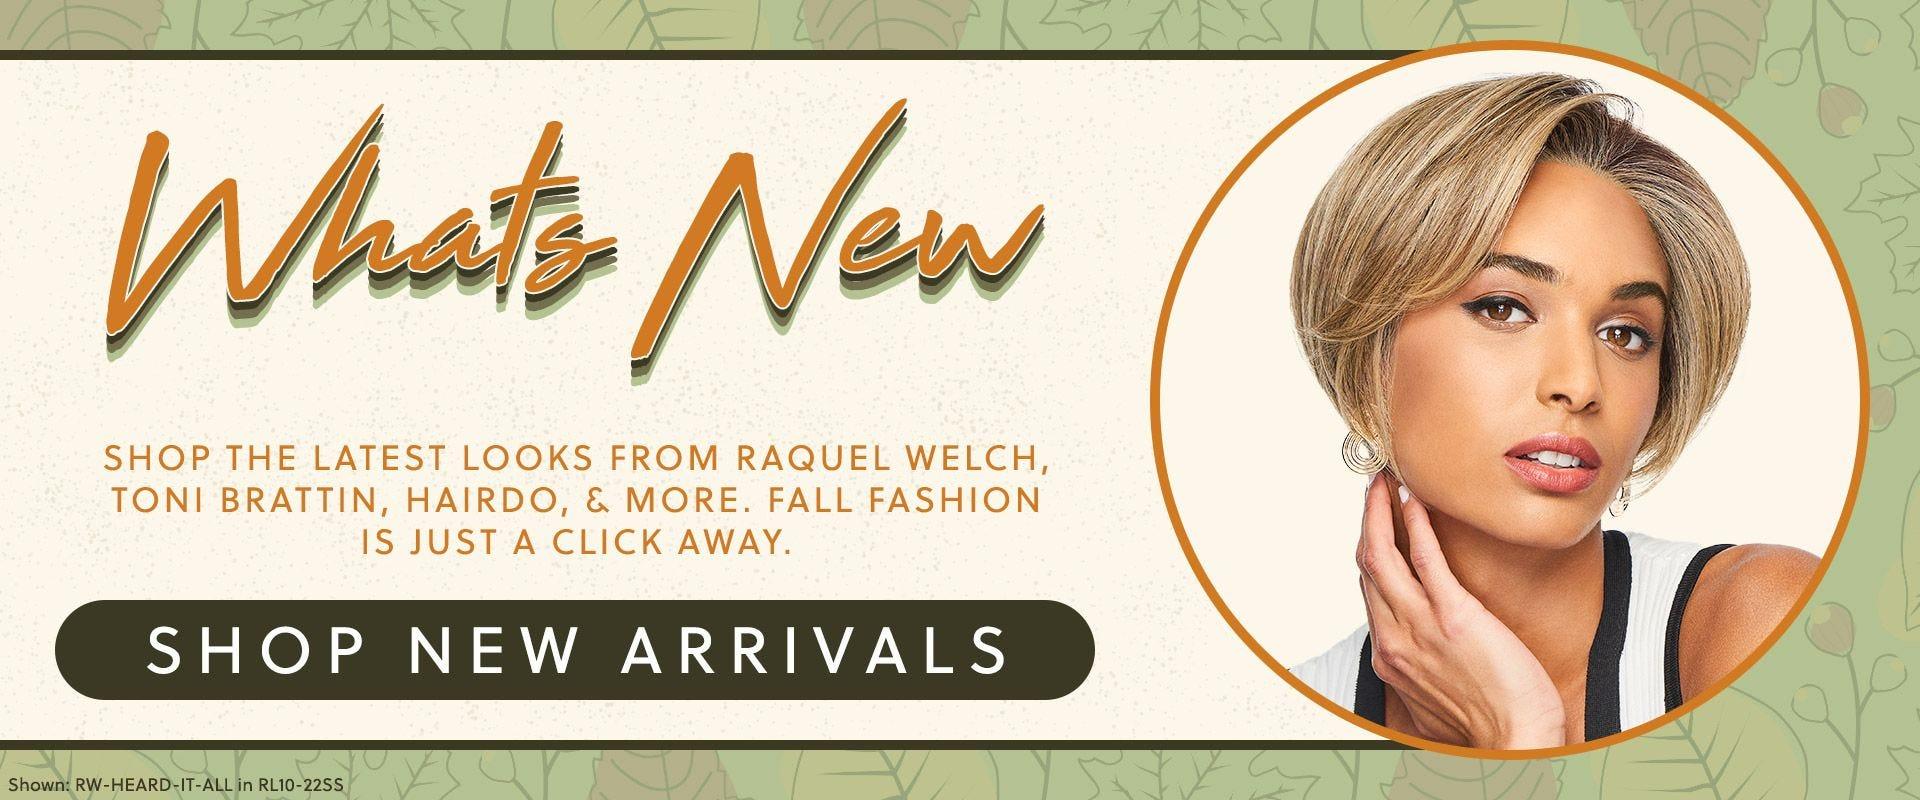 New Arrivals From Raquel Welch, Toni Brattin, & More